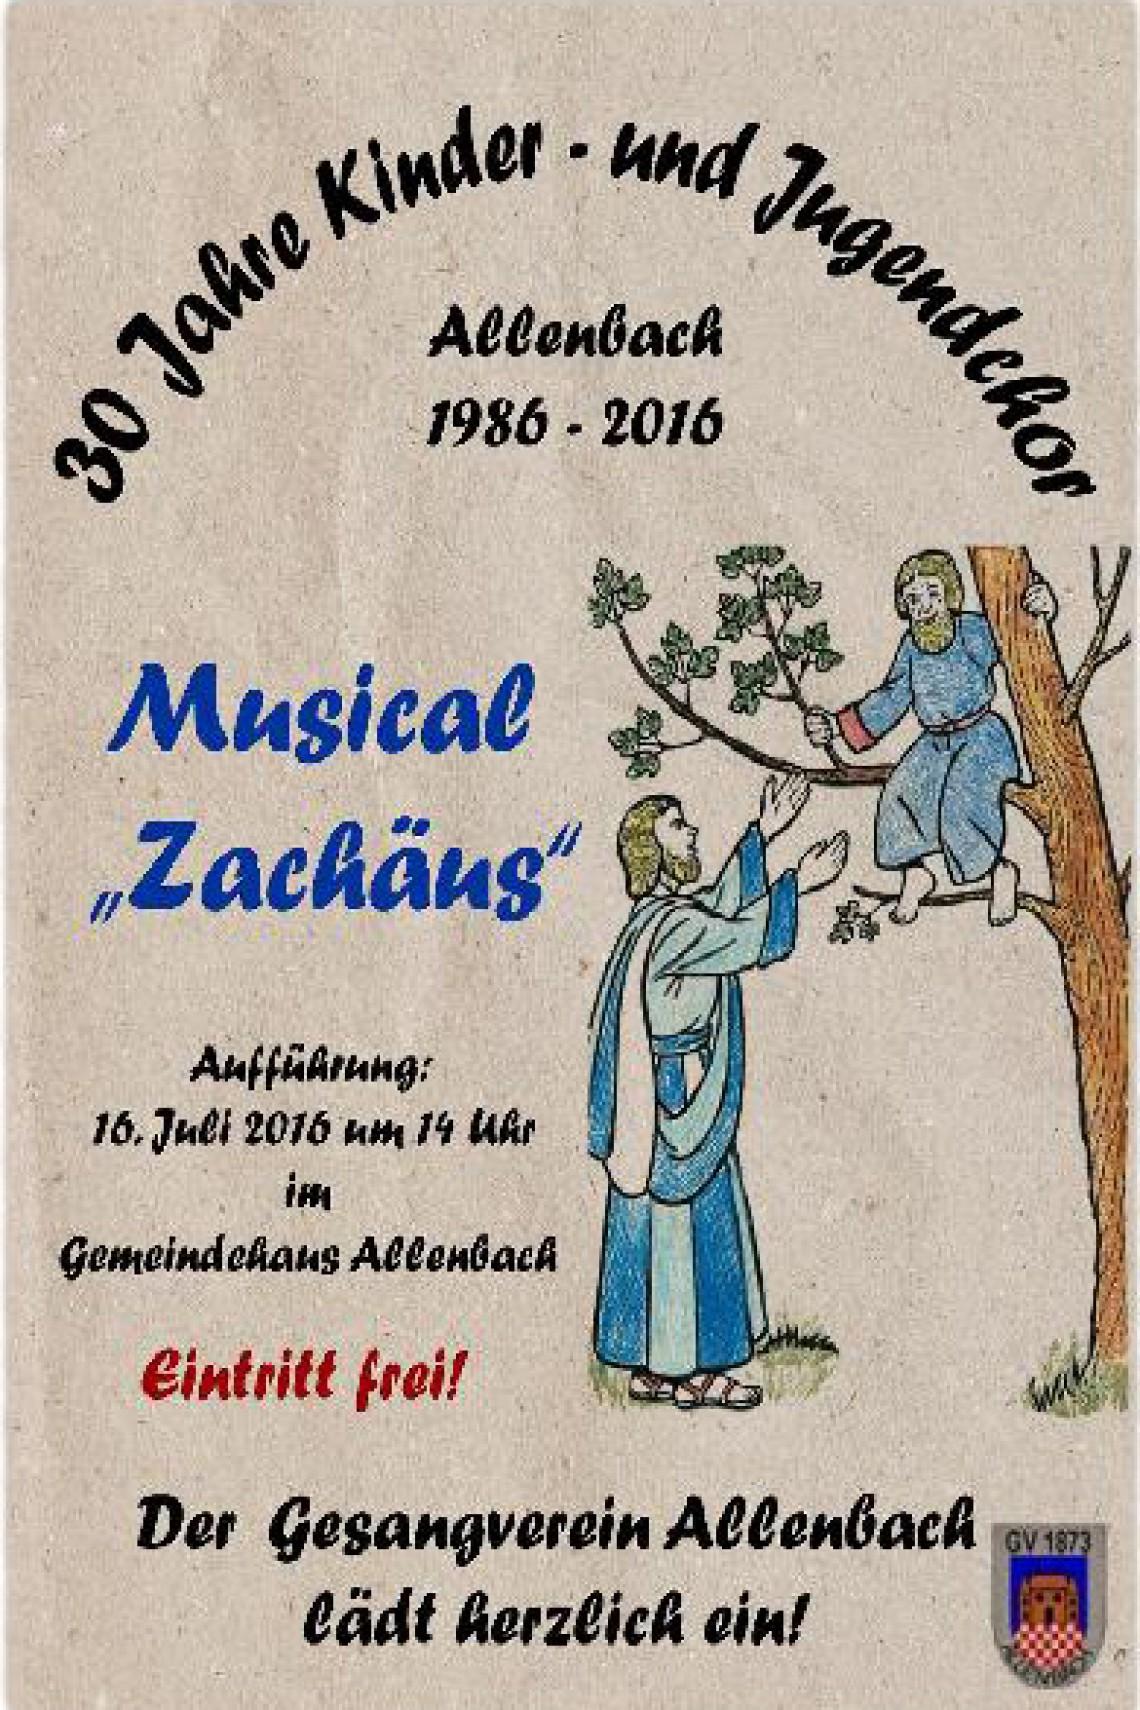 30 Jahre Kinderchor Allenbach